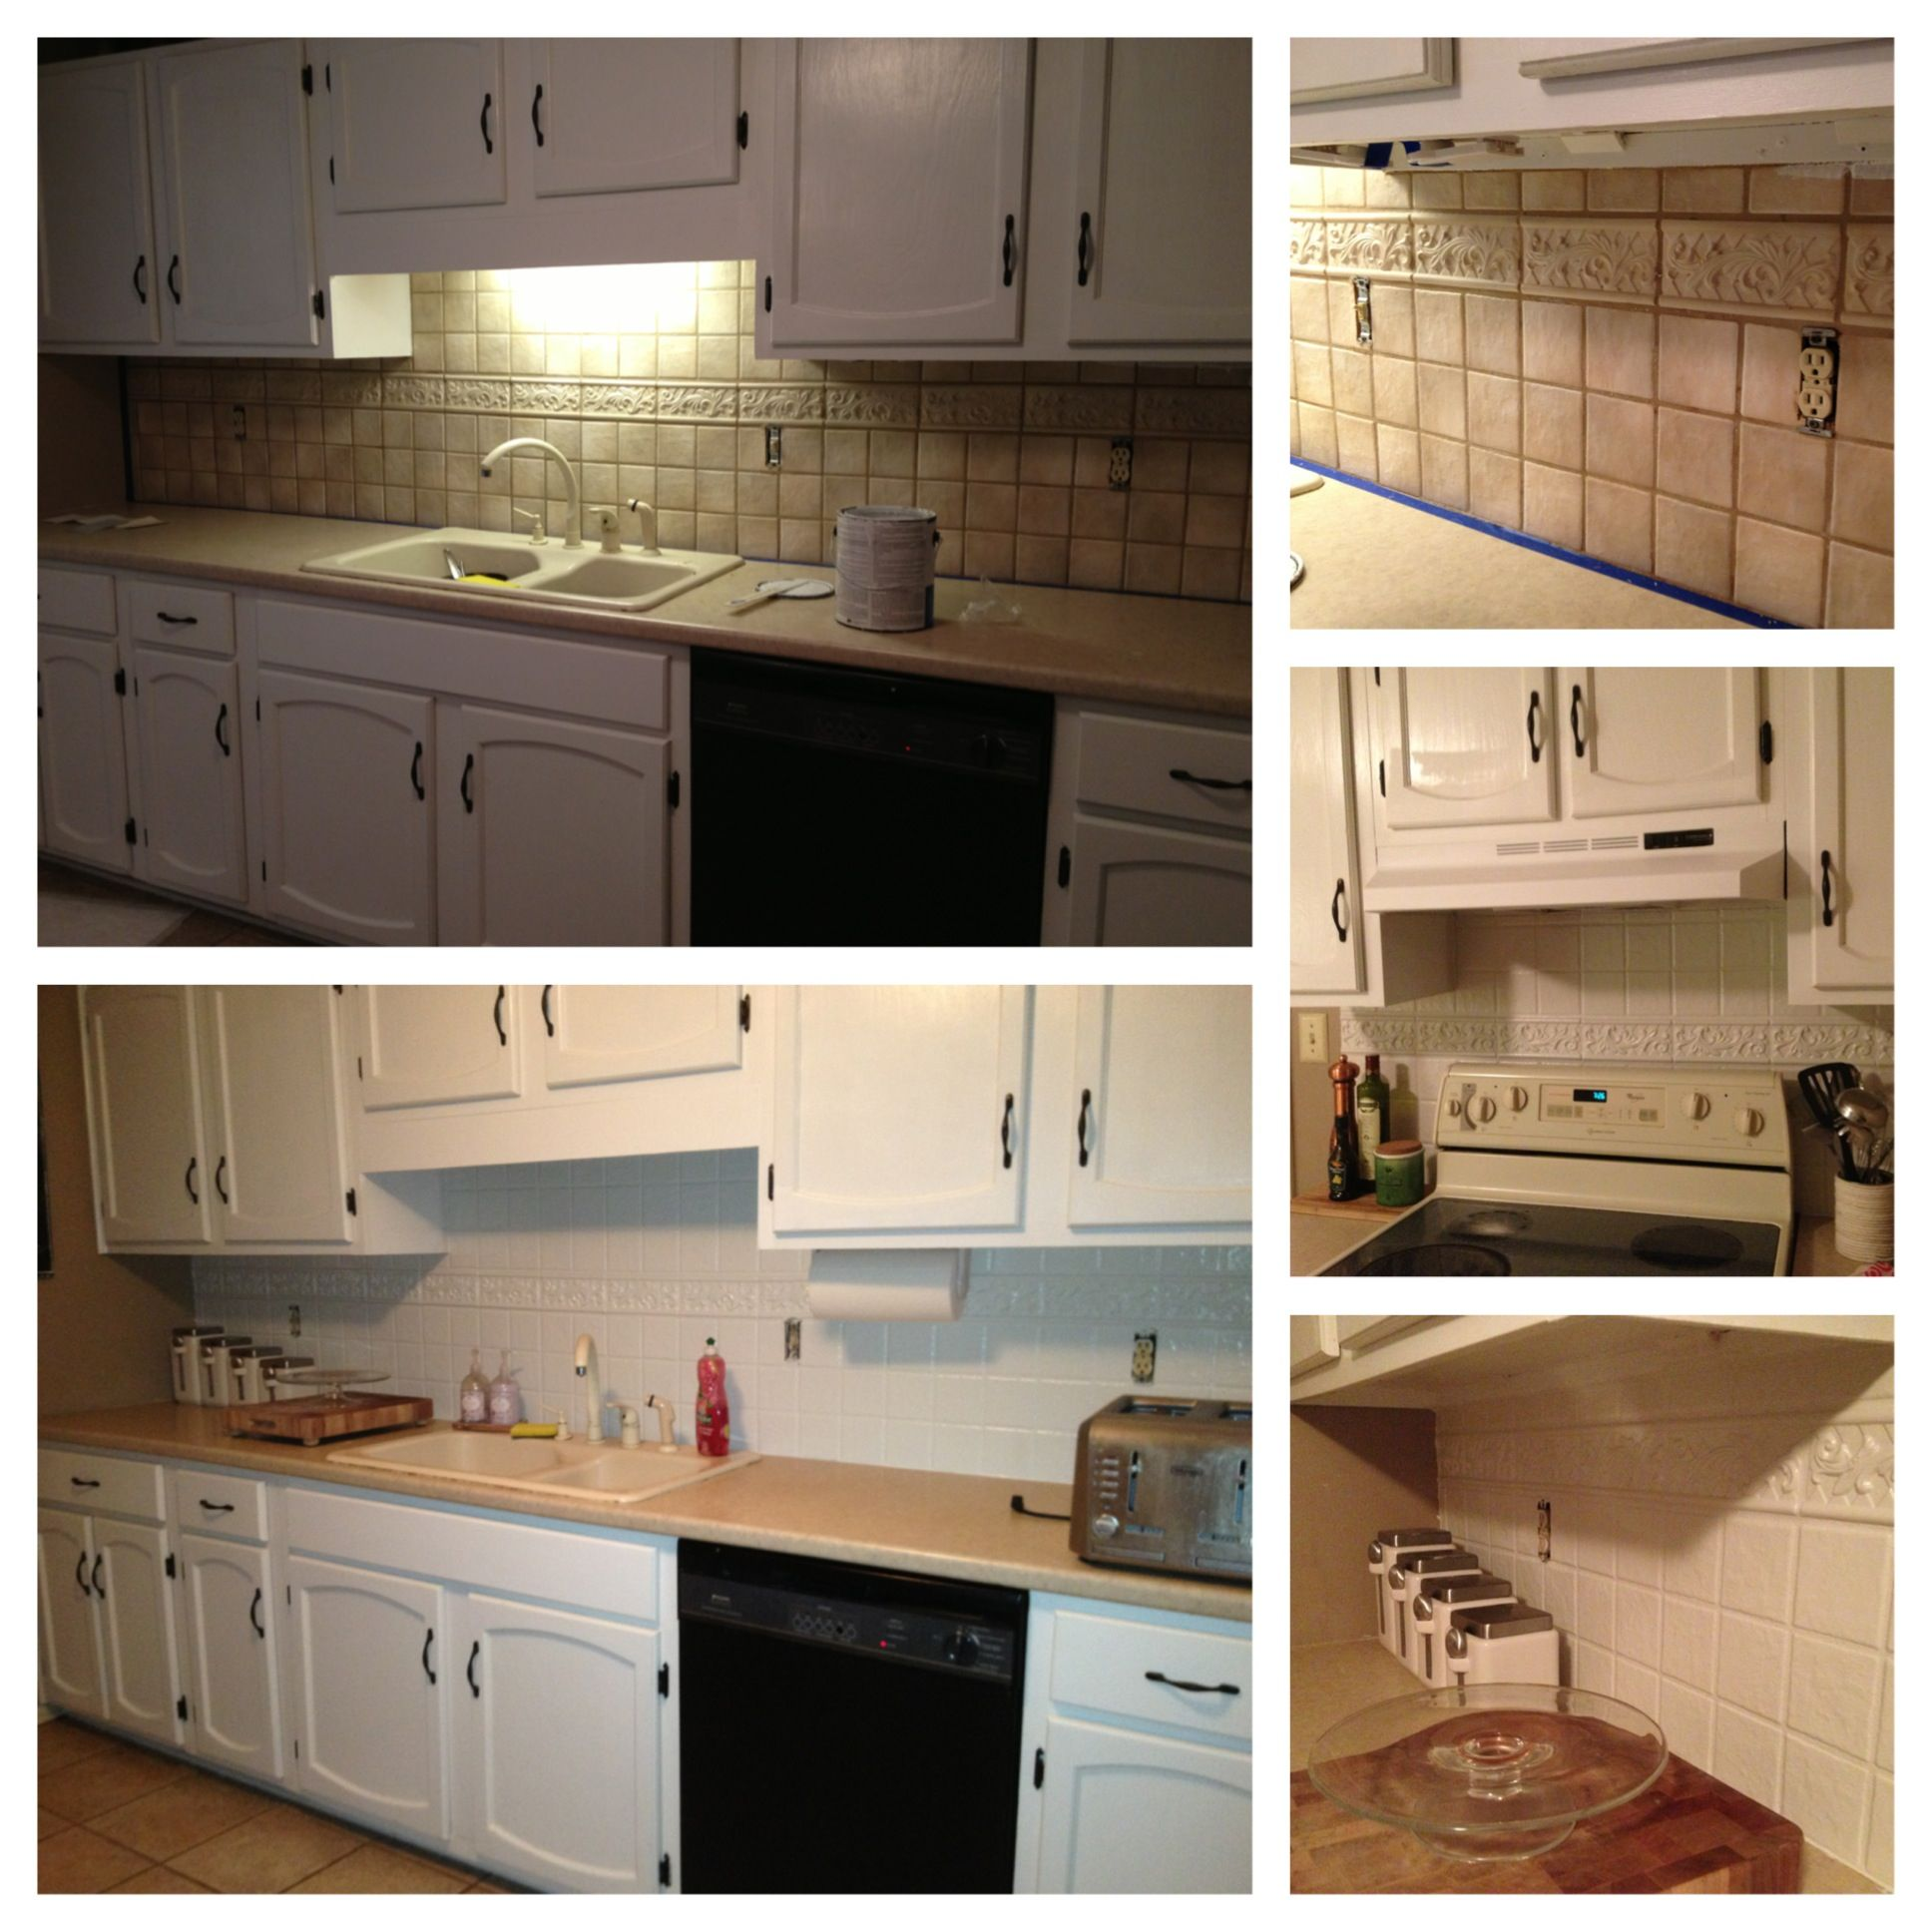 Painting Tile Backsplash Kitchen Inspirations Backsplash Tile Design Home Repairs